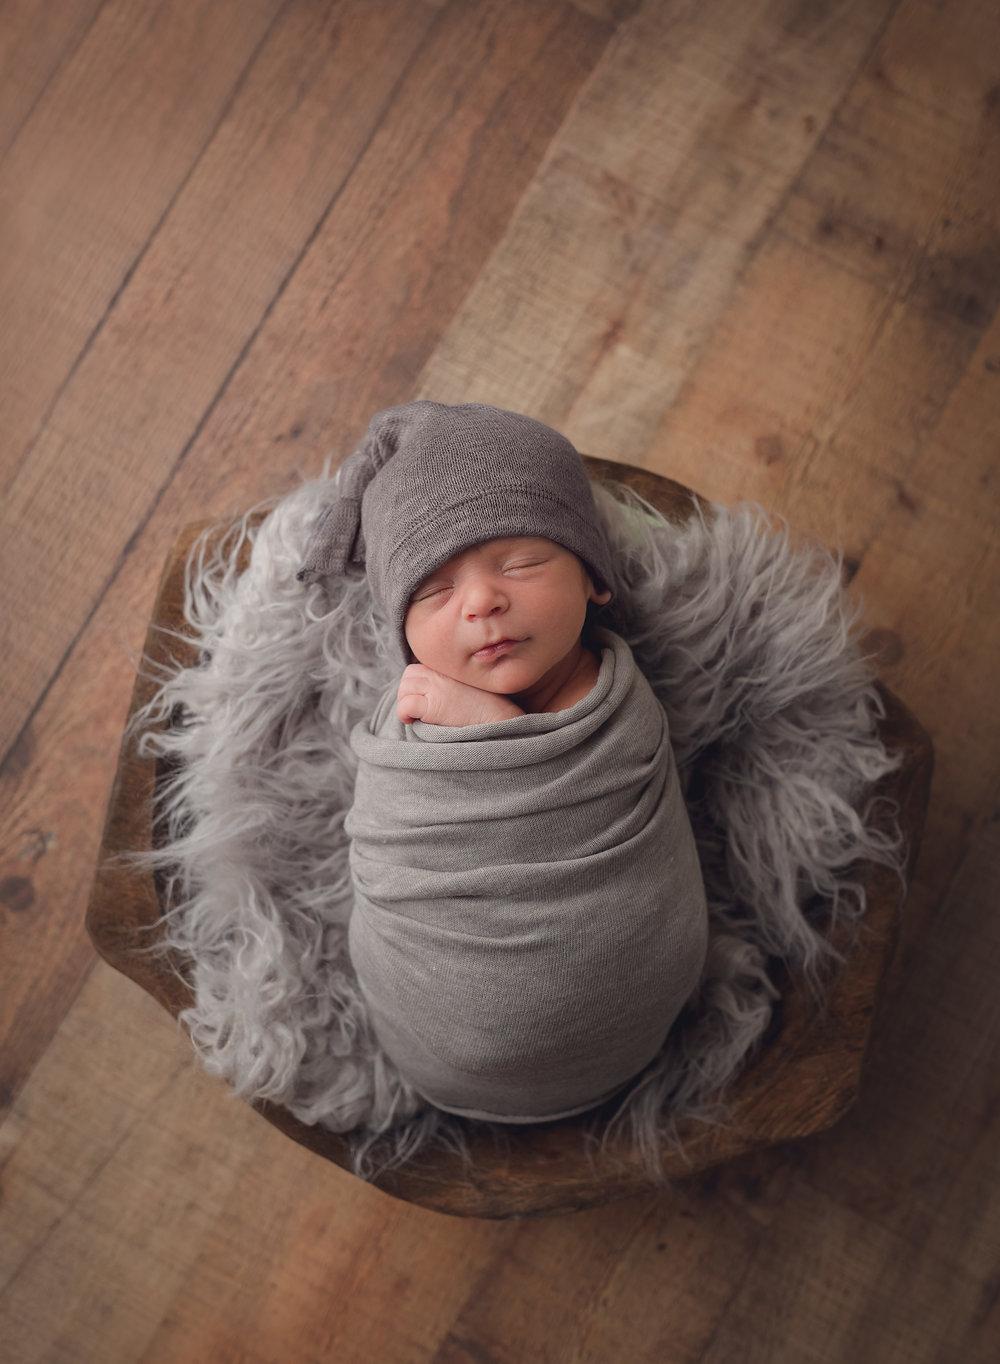 Northern new jersey photographer hudson valley children portrait photographer family photographer newborn read about baby boy